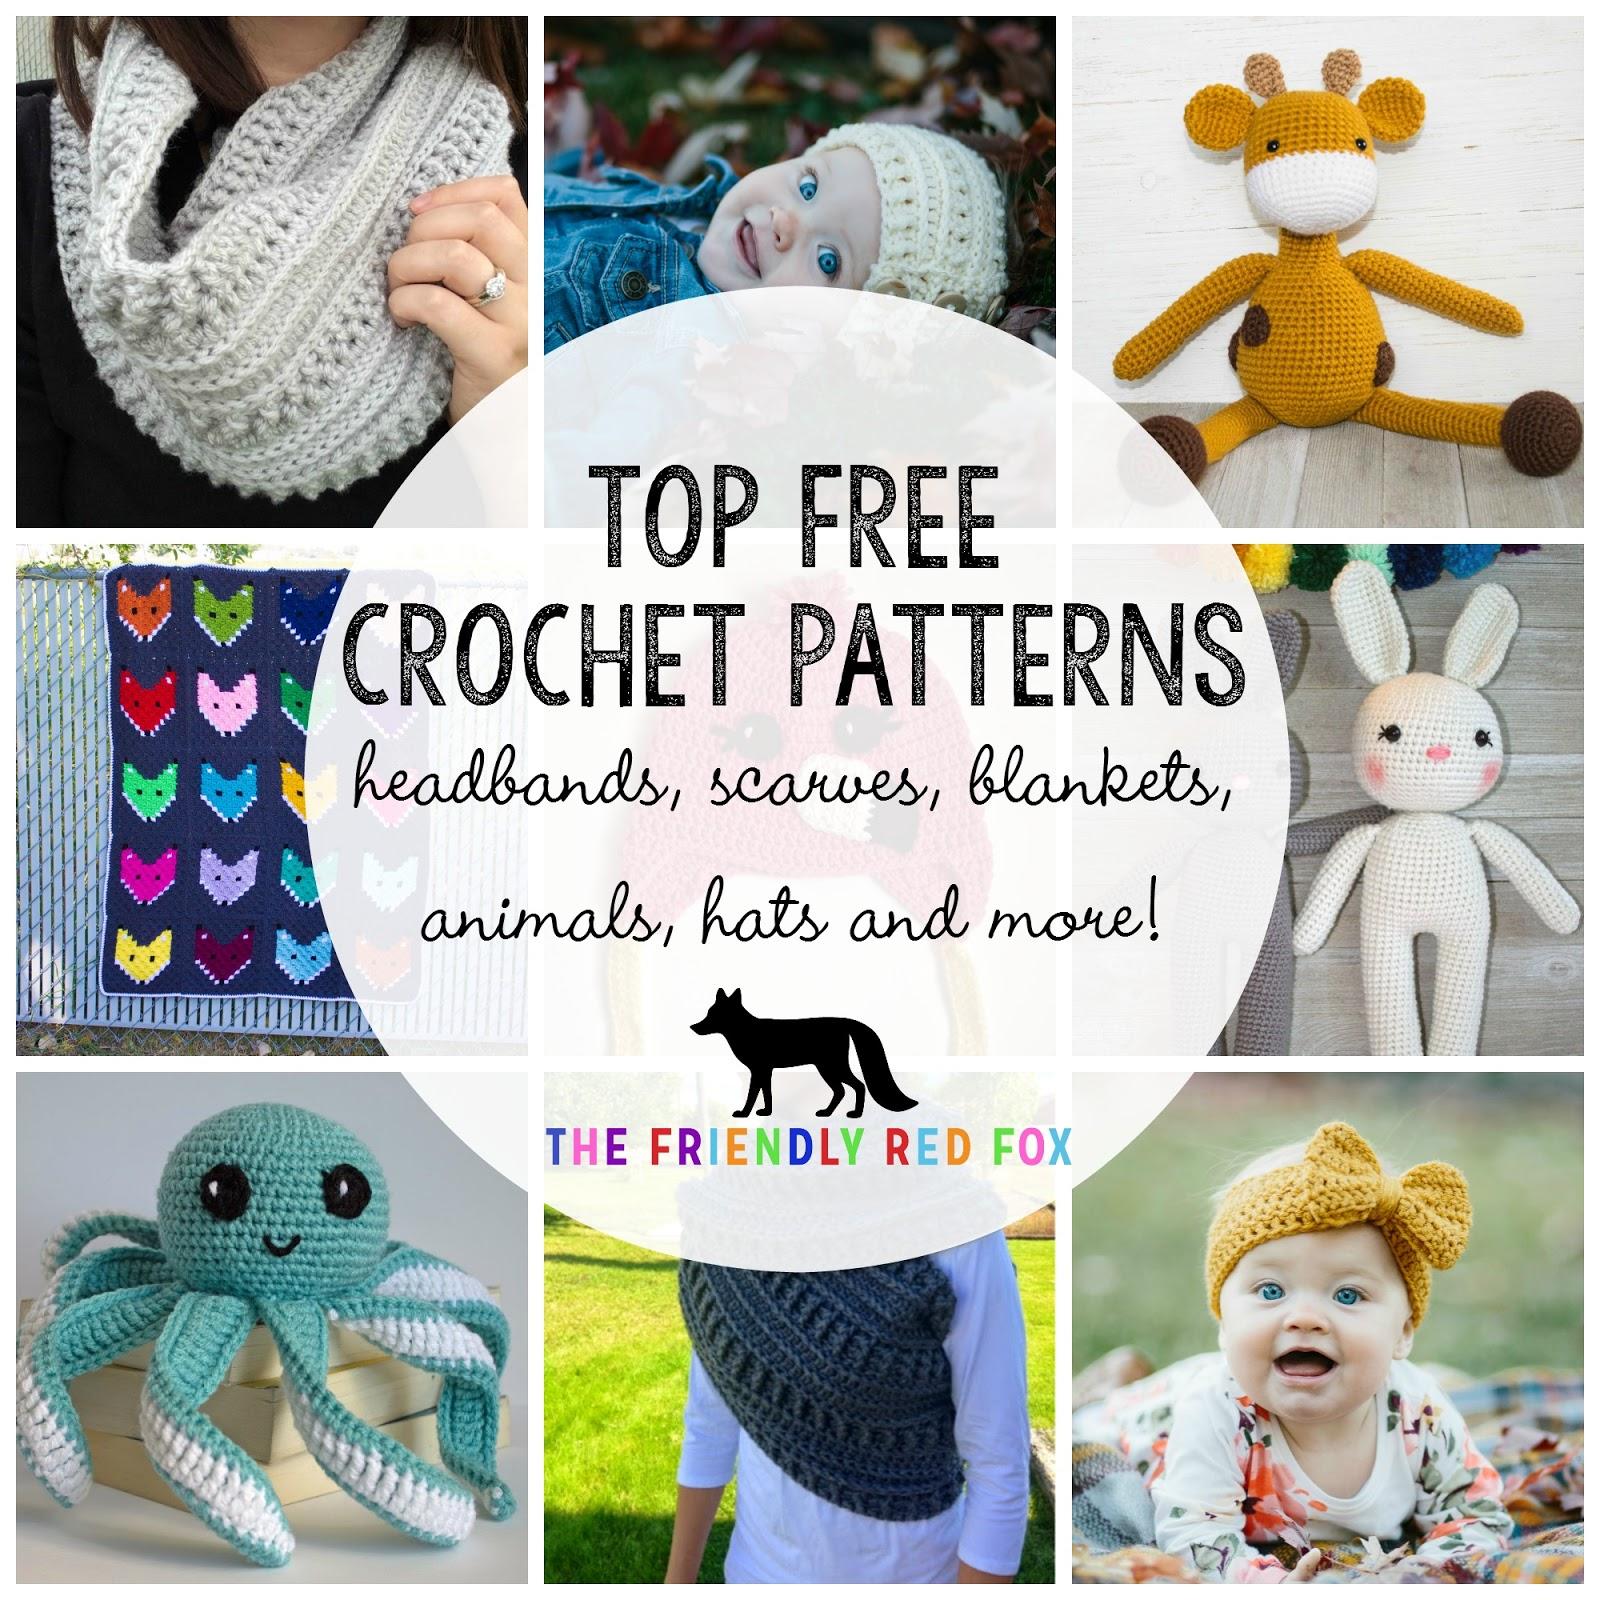 Free Crochet Patterns - thefriendlyredfox.com